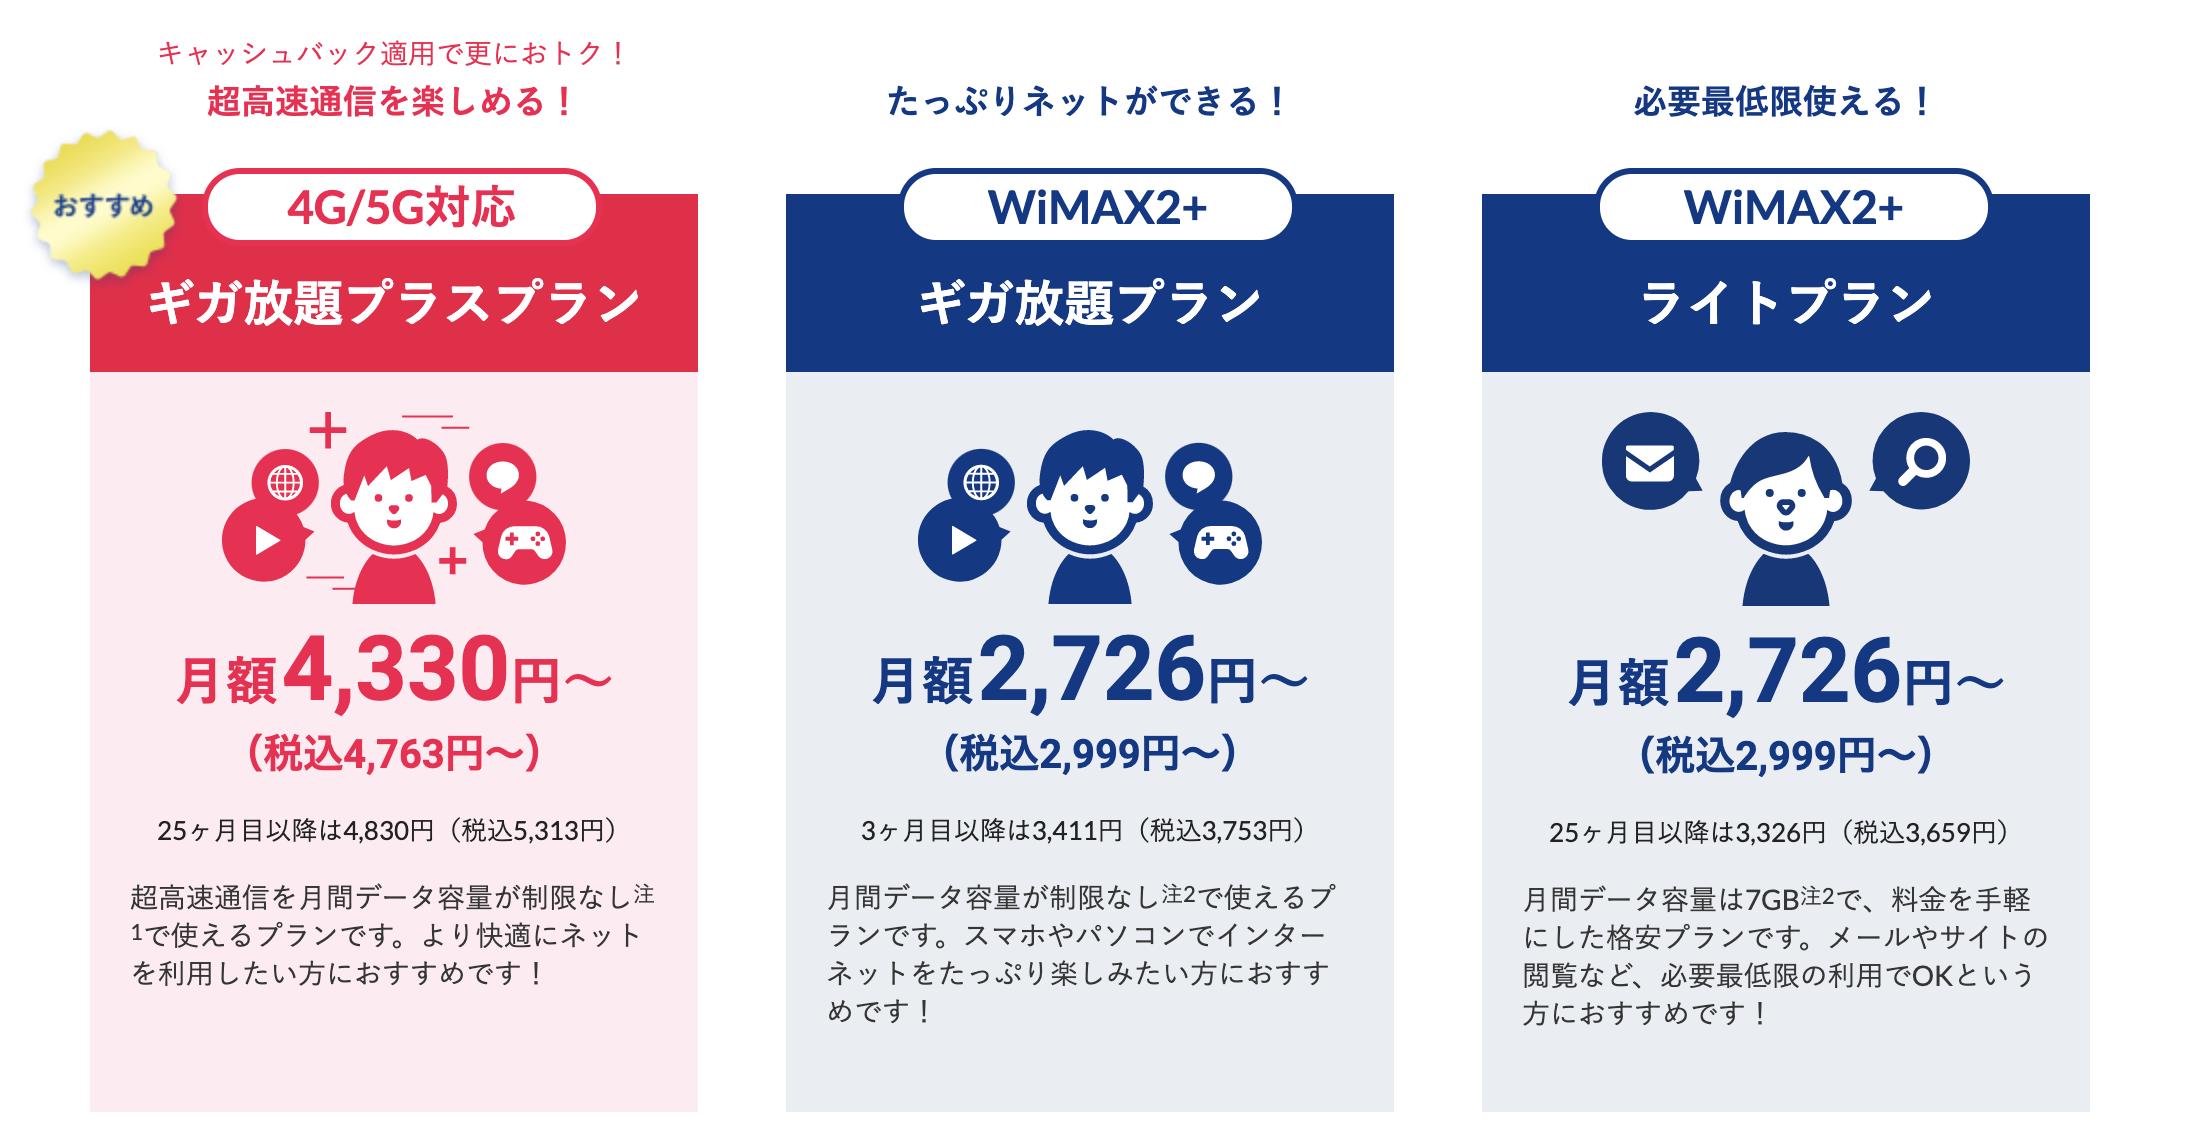 Broad WiMAX(ブロードワイマックス)の契約プラン